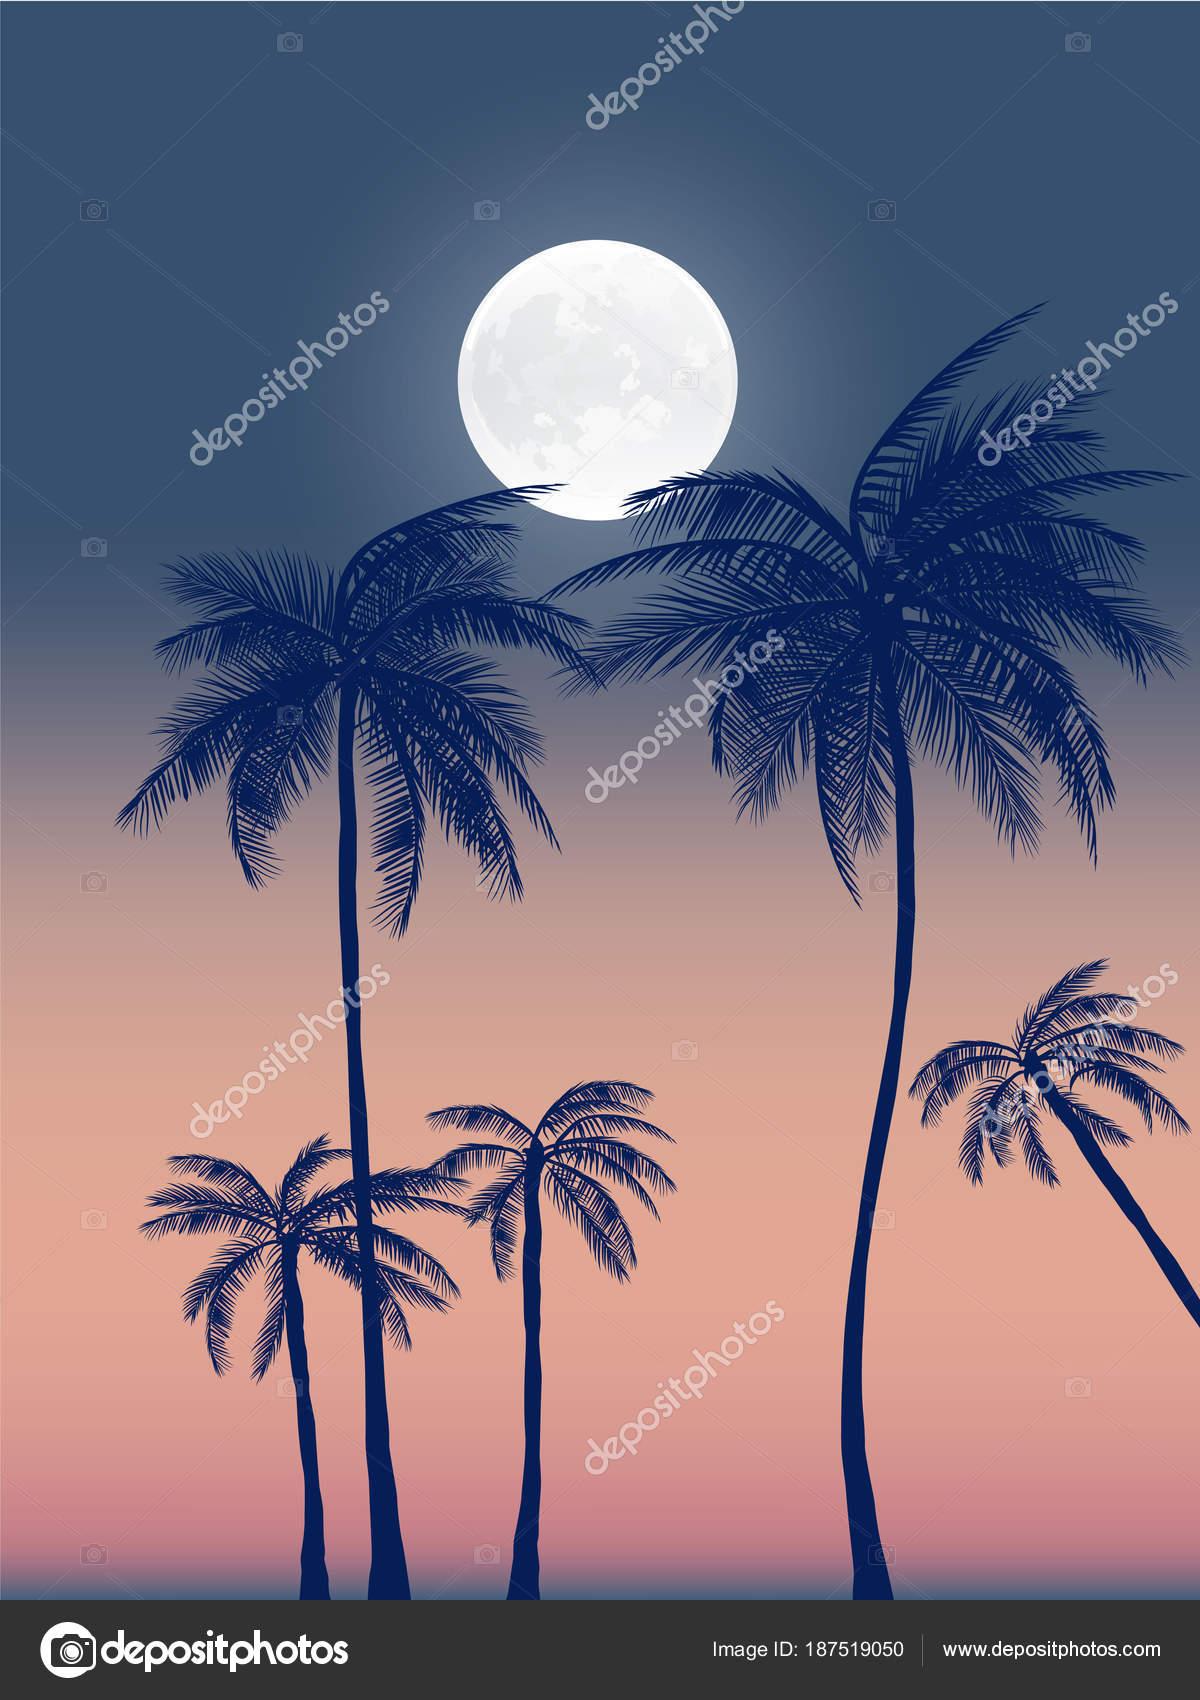 Zomer Californië Tumblr Achtergronden Instellen Met Palmen Sky